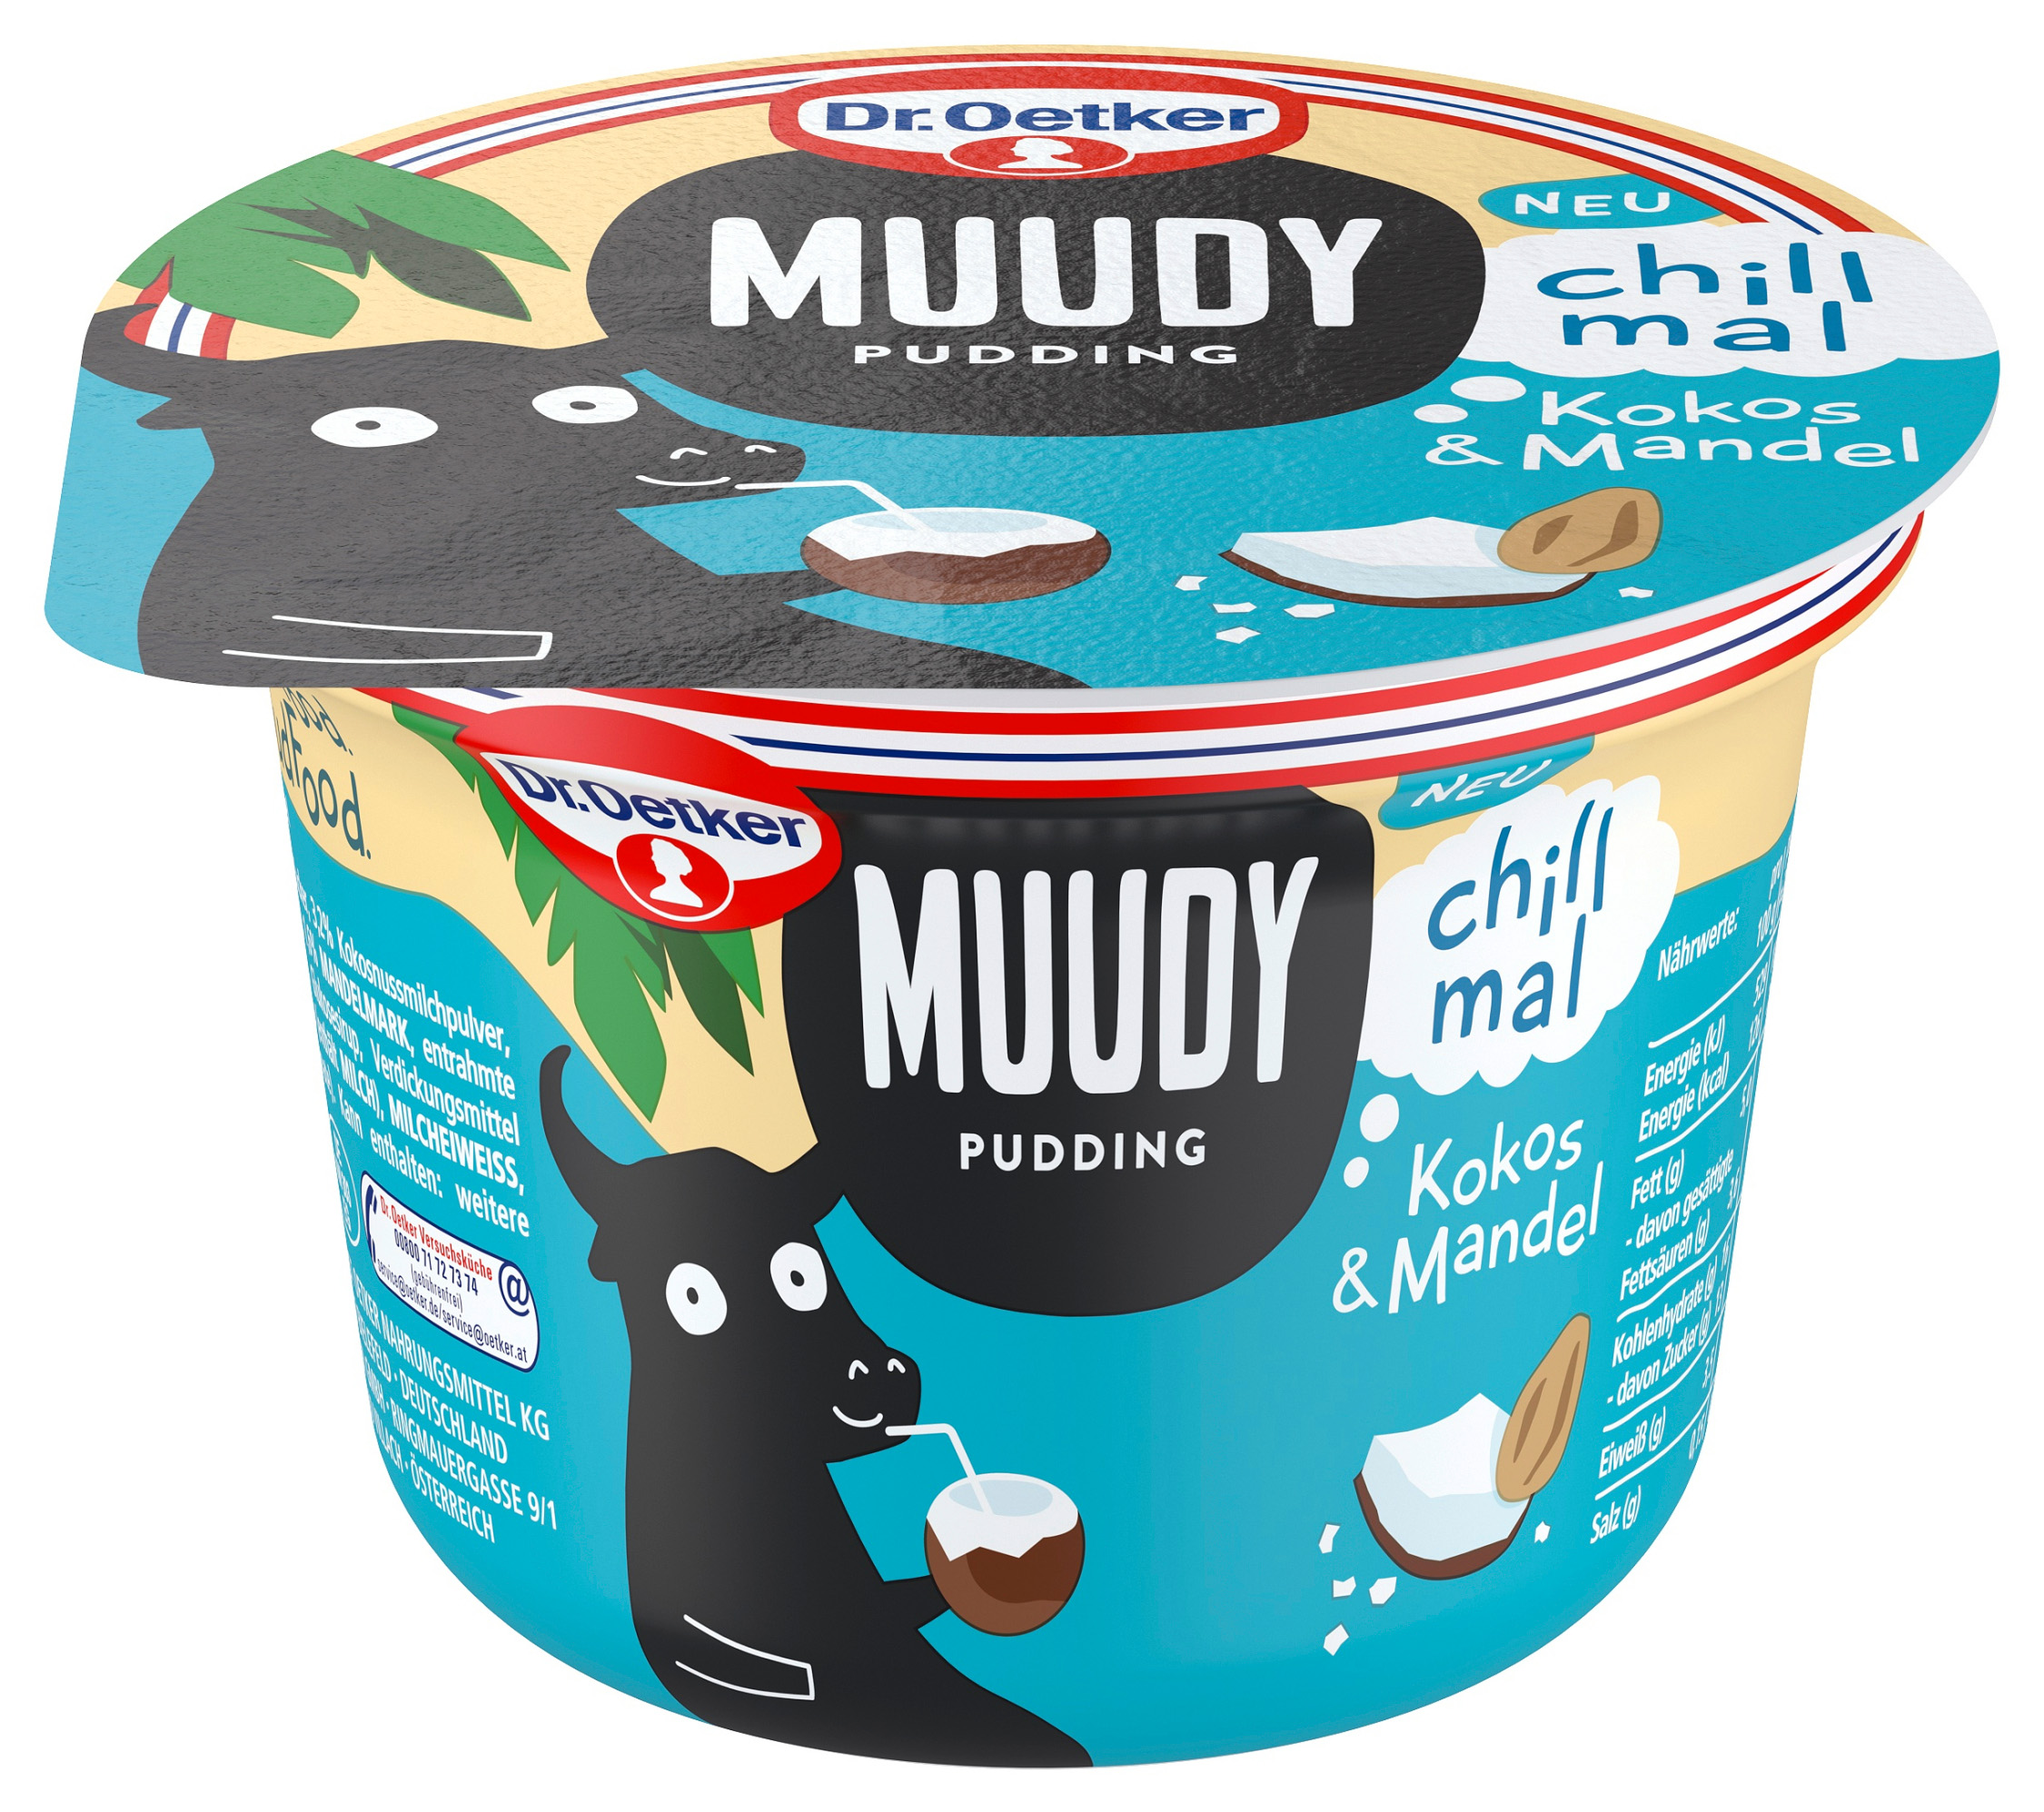 Dr. Oetker_Muudy-Pudding_Kokos-Mandel_Packshot